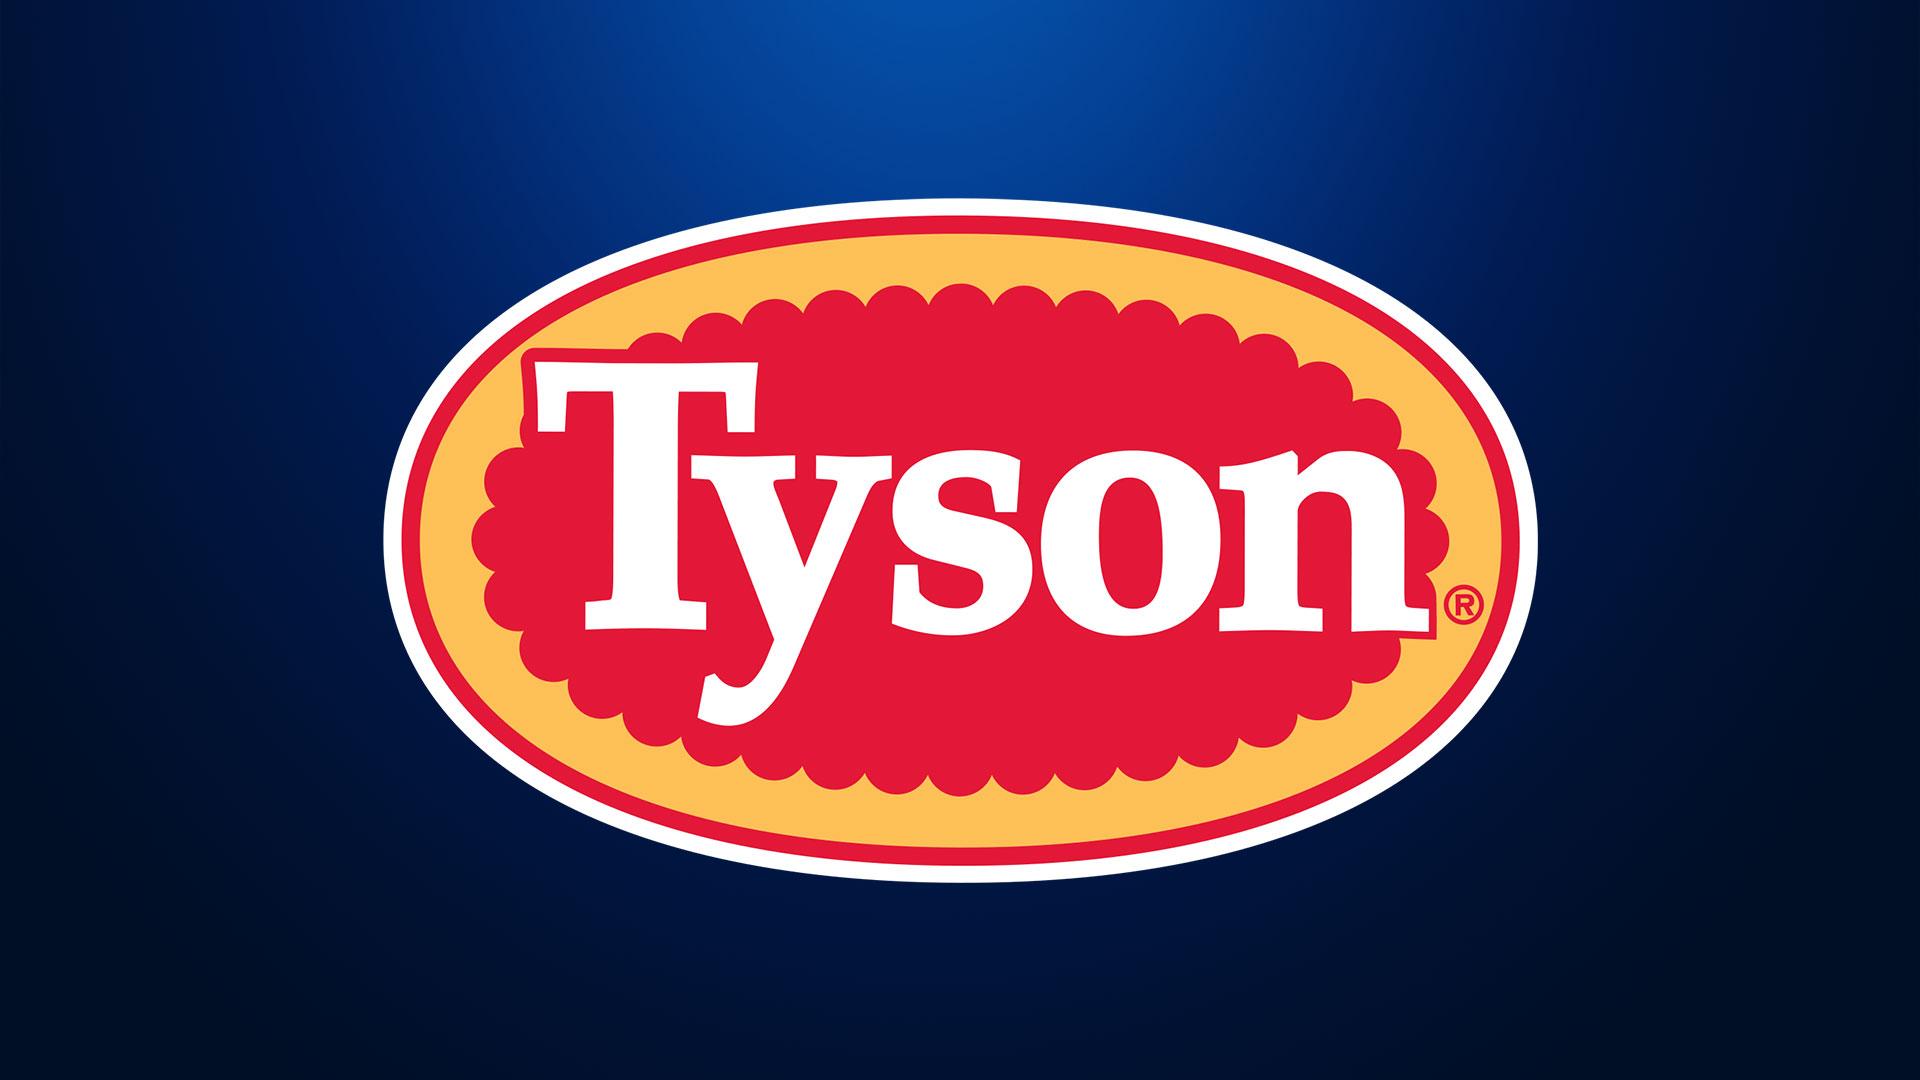 KELO Tyson